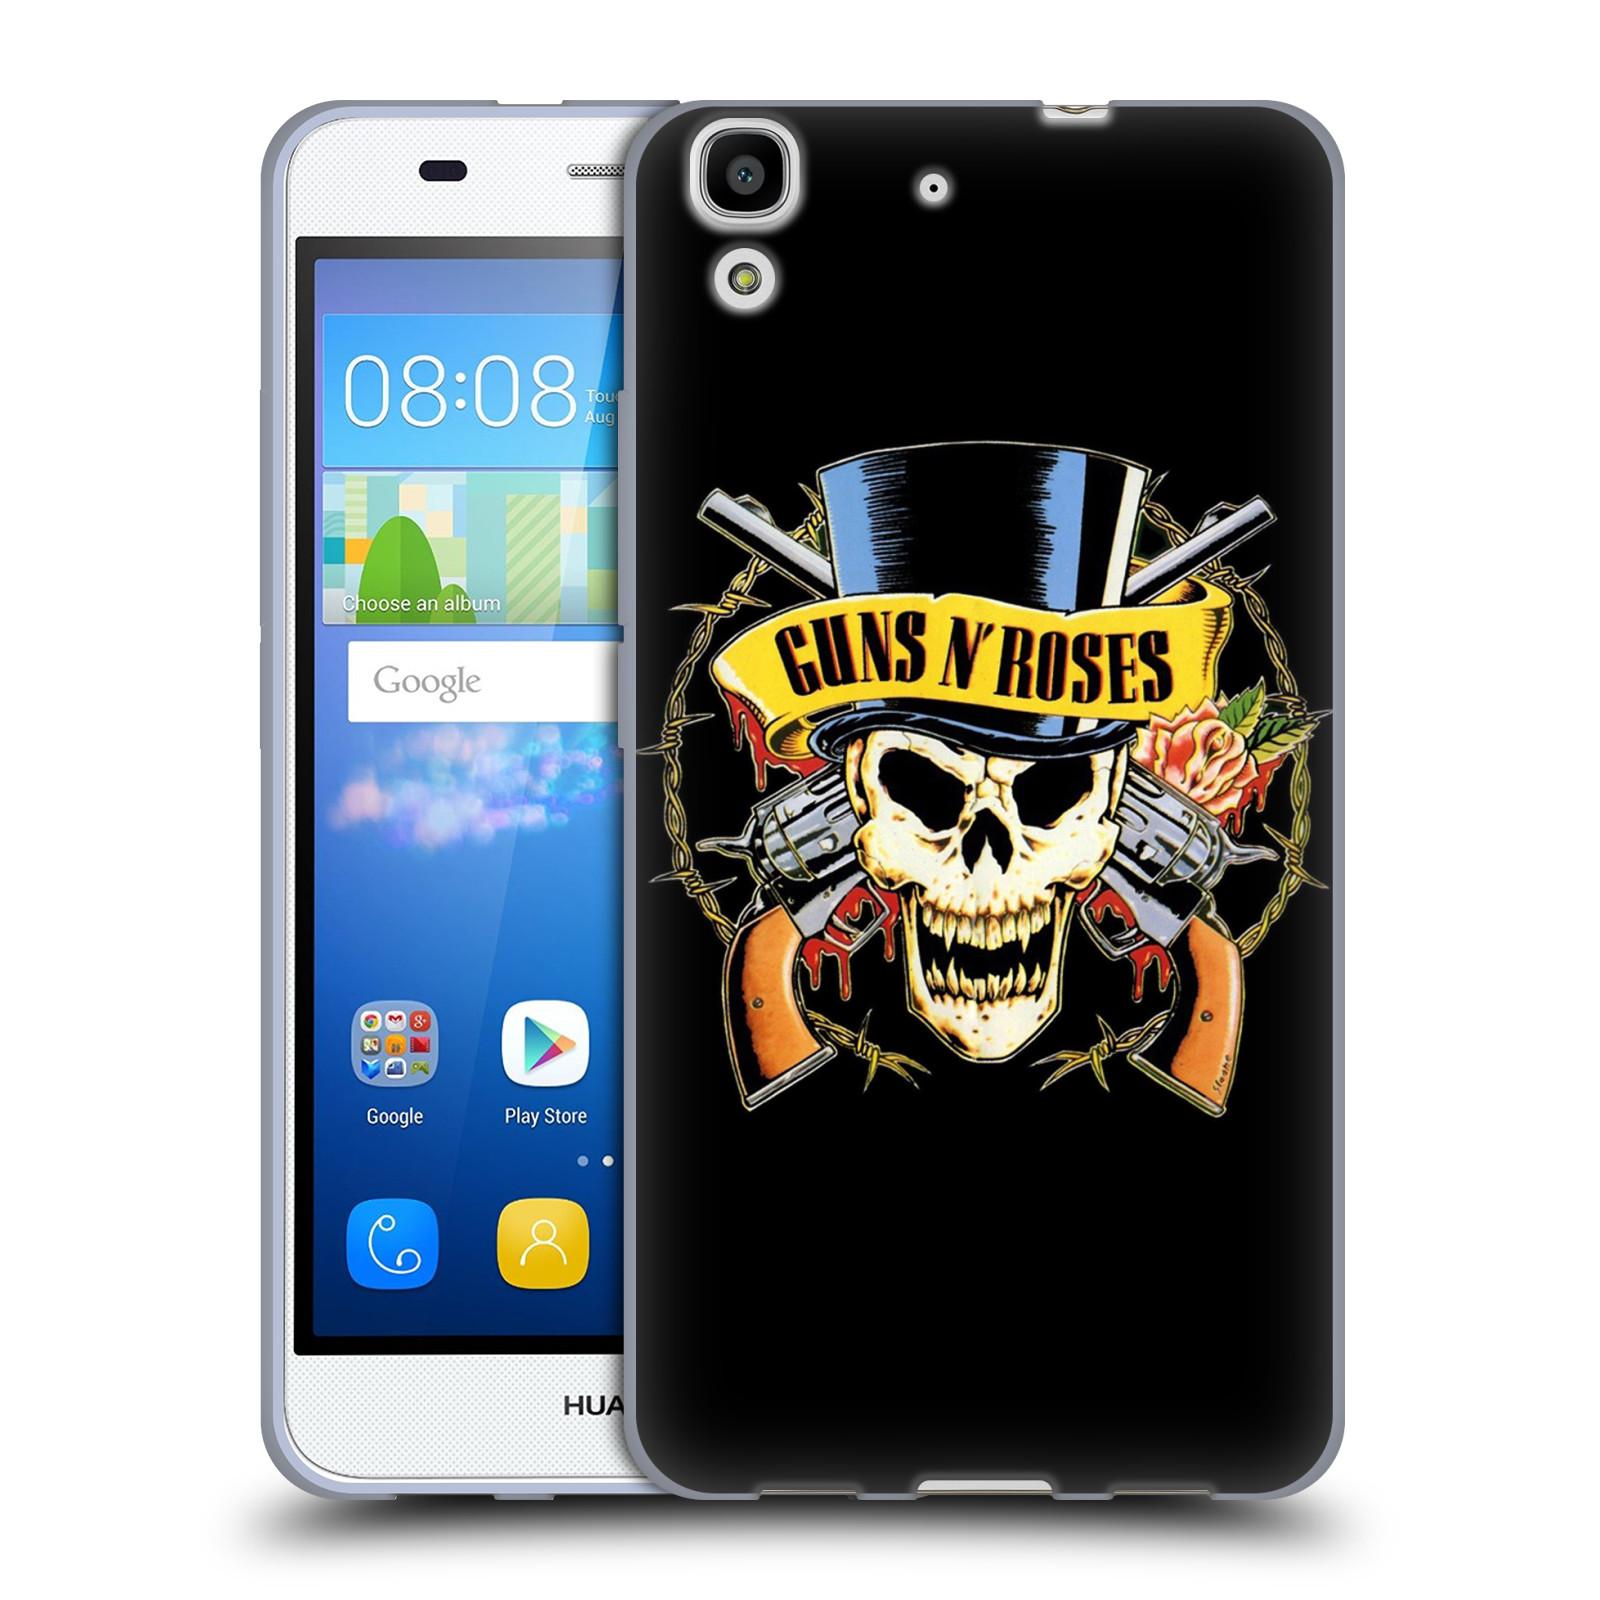 Silikonové pouzdro na mobil Huawei Y6 HEAD CASE Guns N' Roses - Lebka